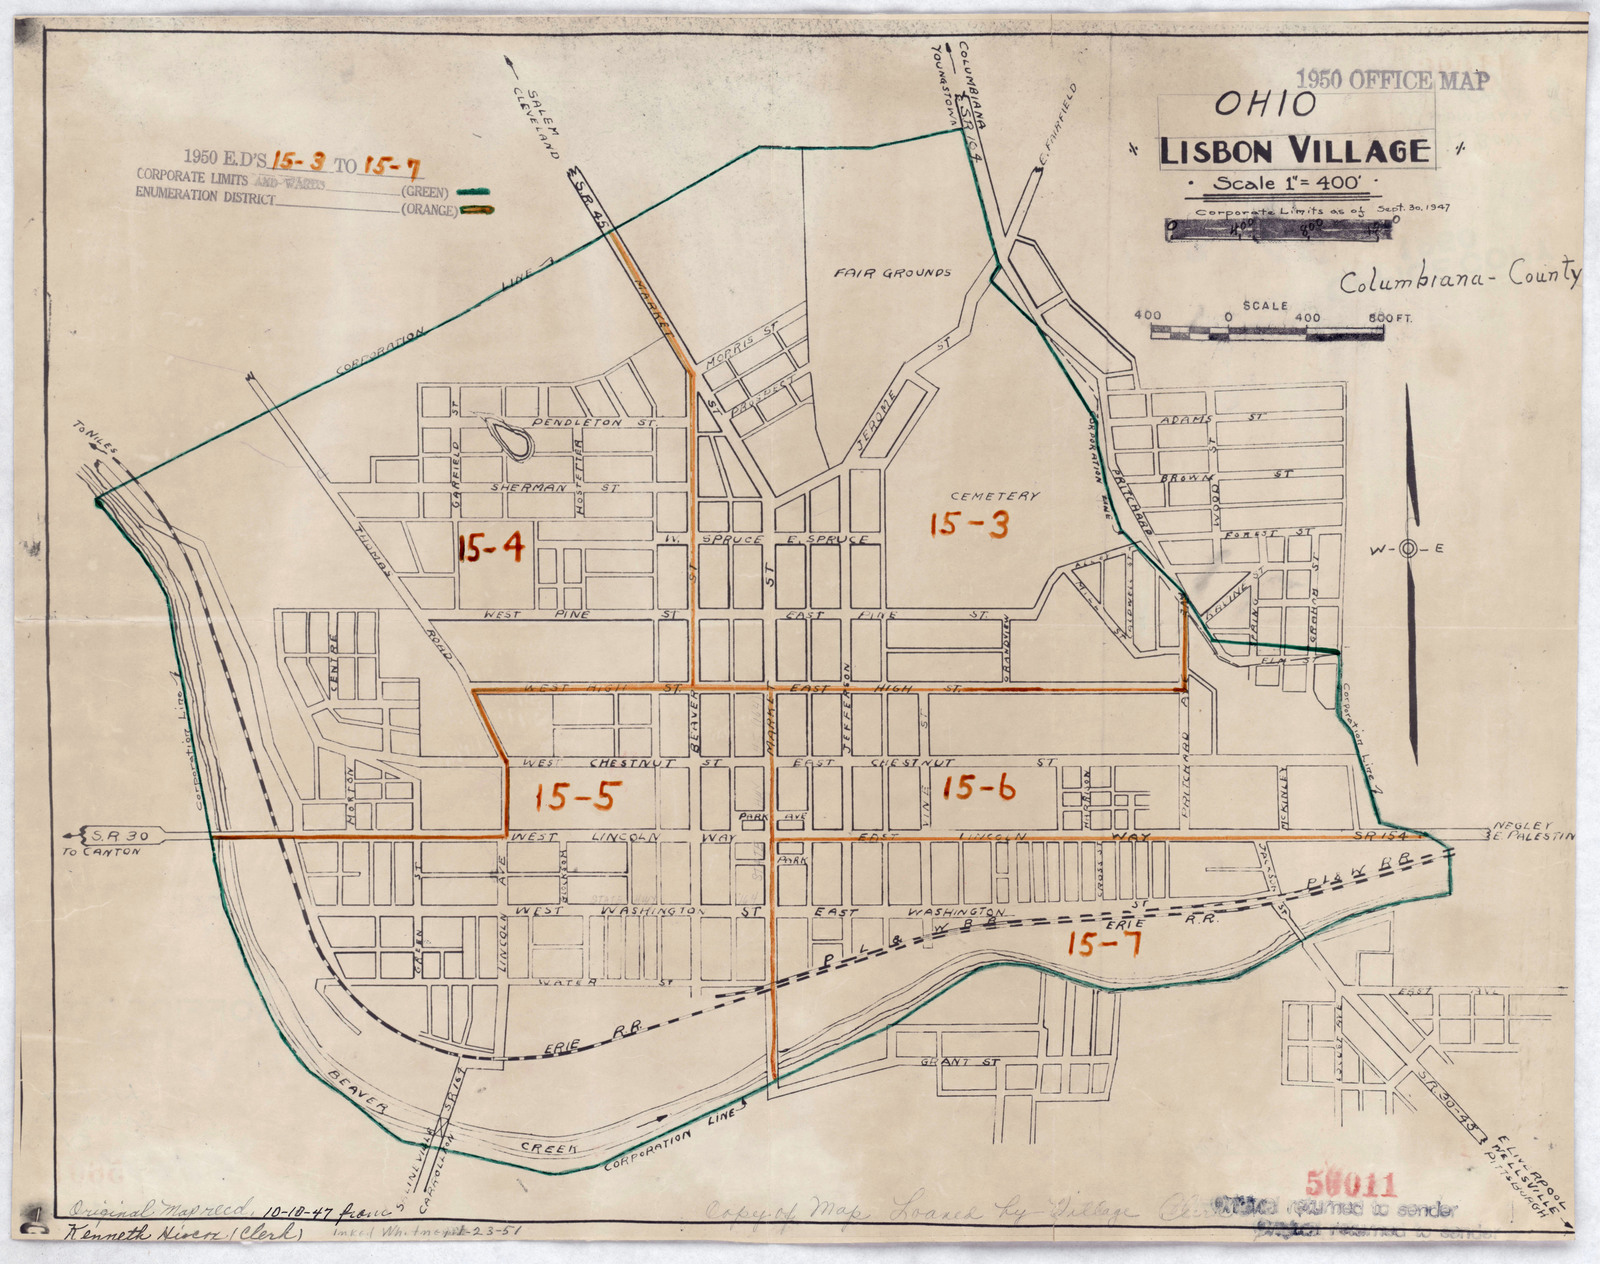 1950 Census Enumeration District Maps - Ohio (OH) - Columbiana County - Lisbon - ED 15-3 to 7